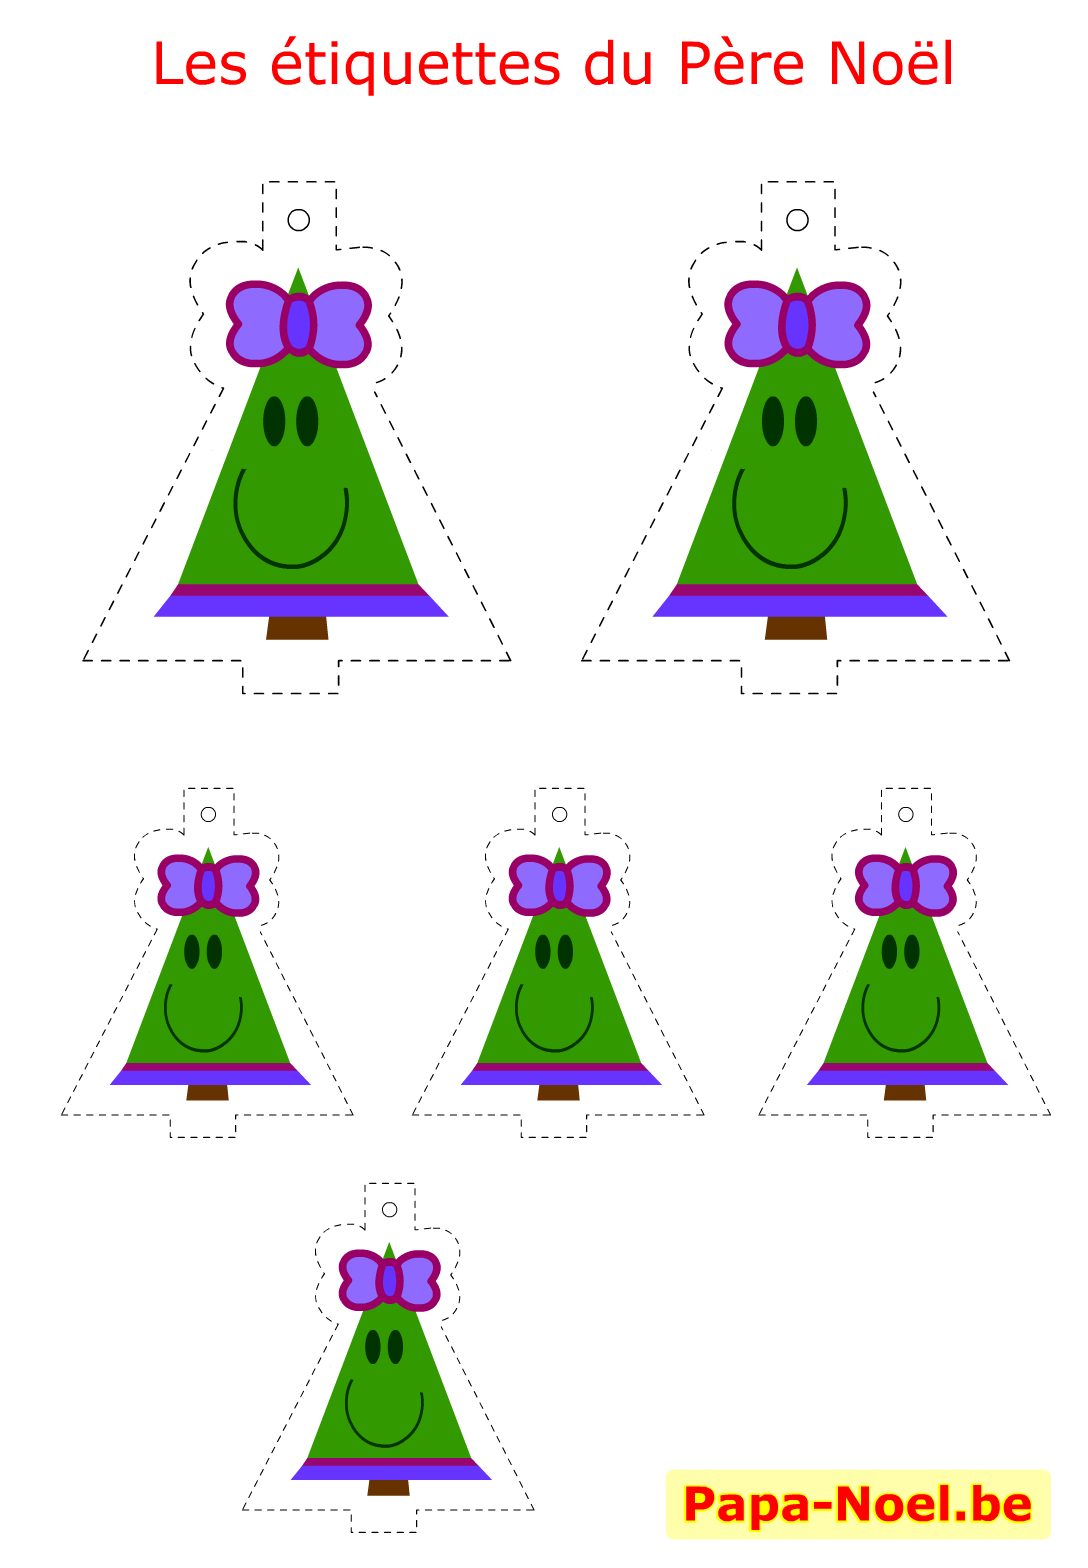 #063800 Bricolage Enfant NOEL Etiquettes A Imprimer Gratuites Pour  6950 Deco De Noel Gratuite A Imprimer 1088x1568 px @ aertt.com